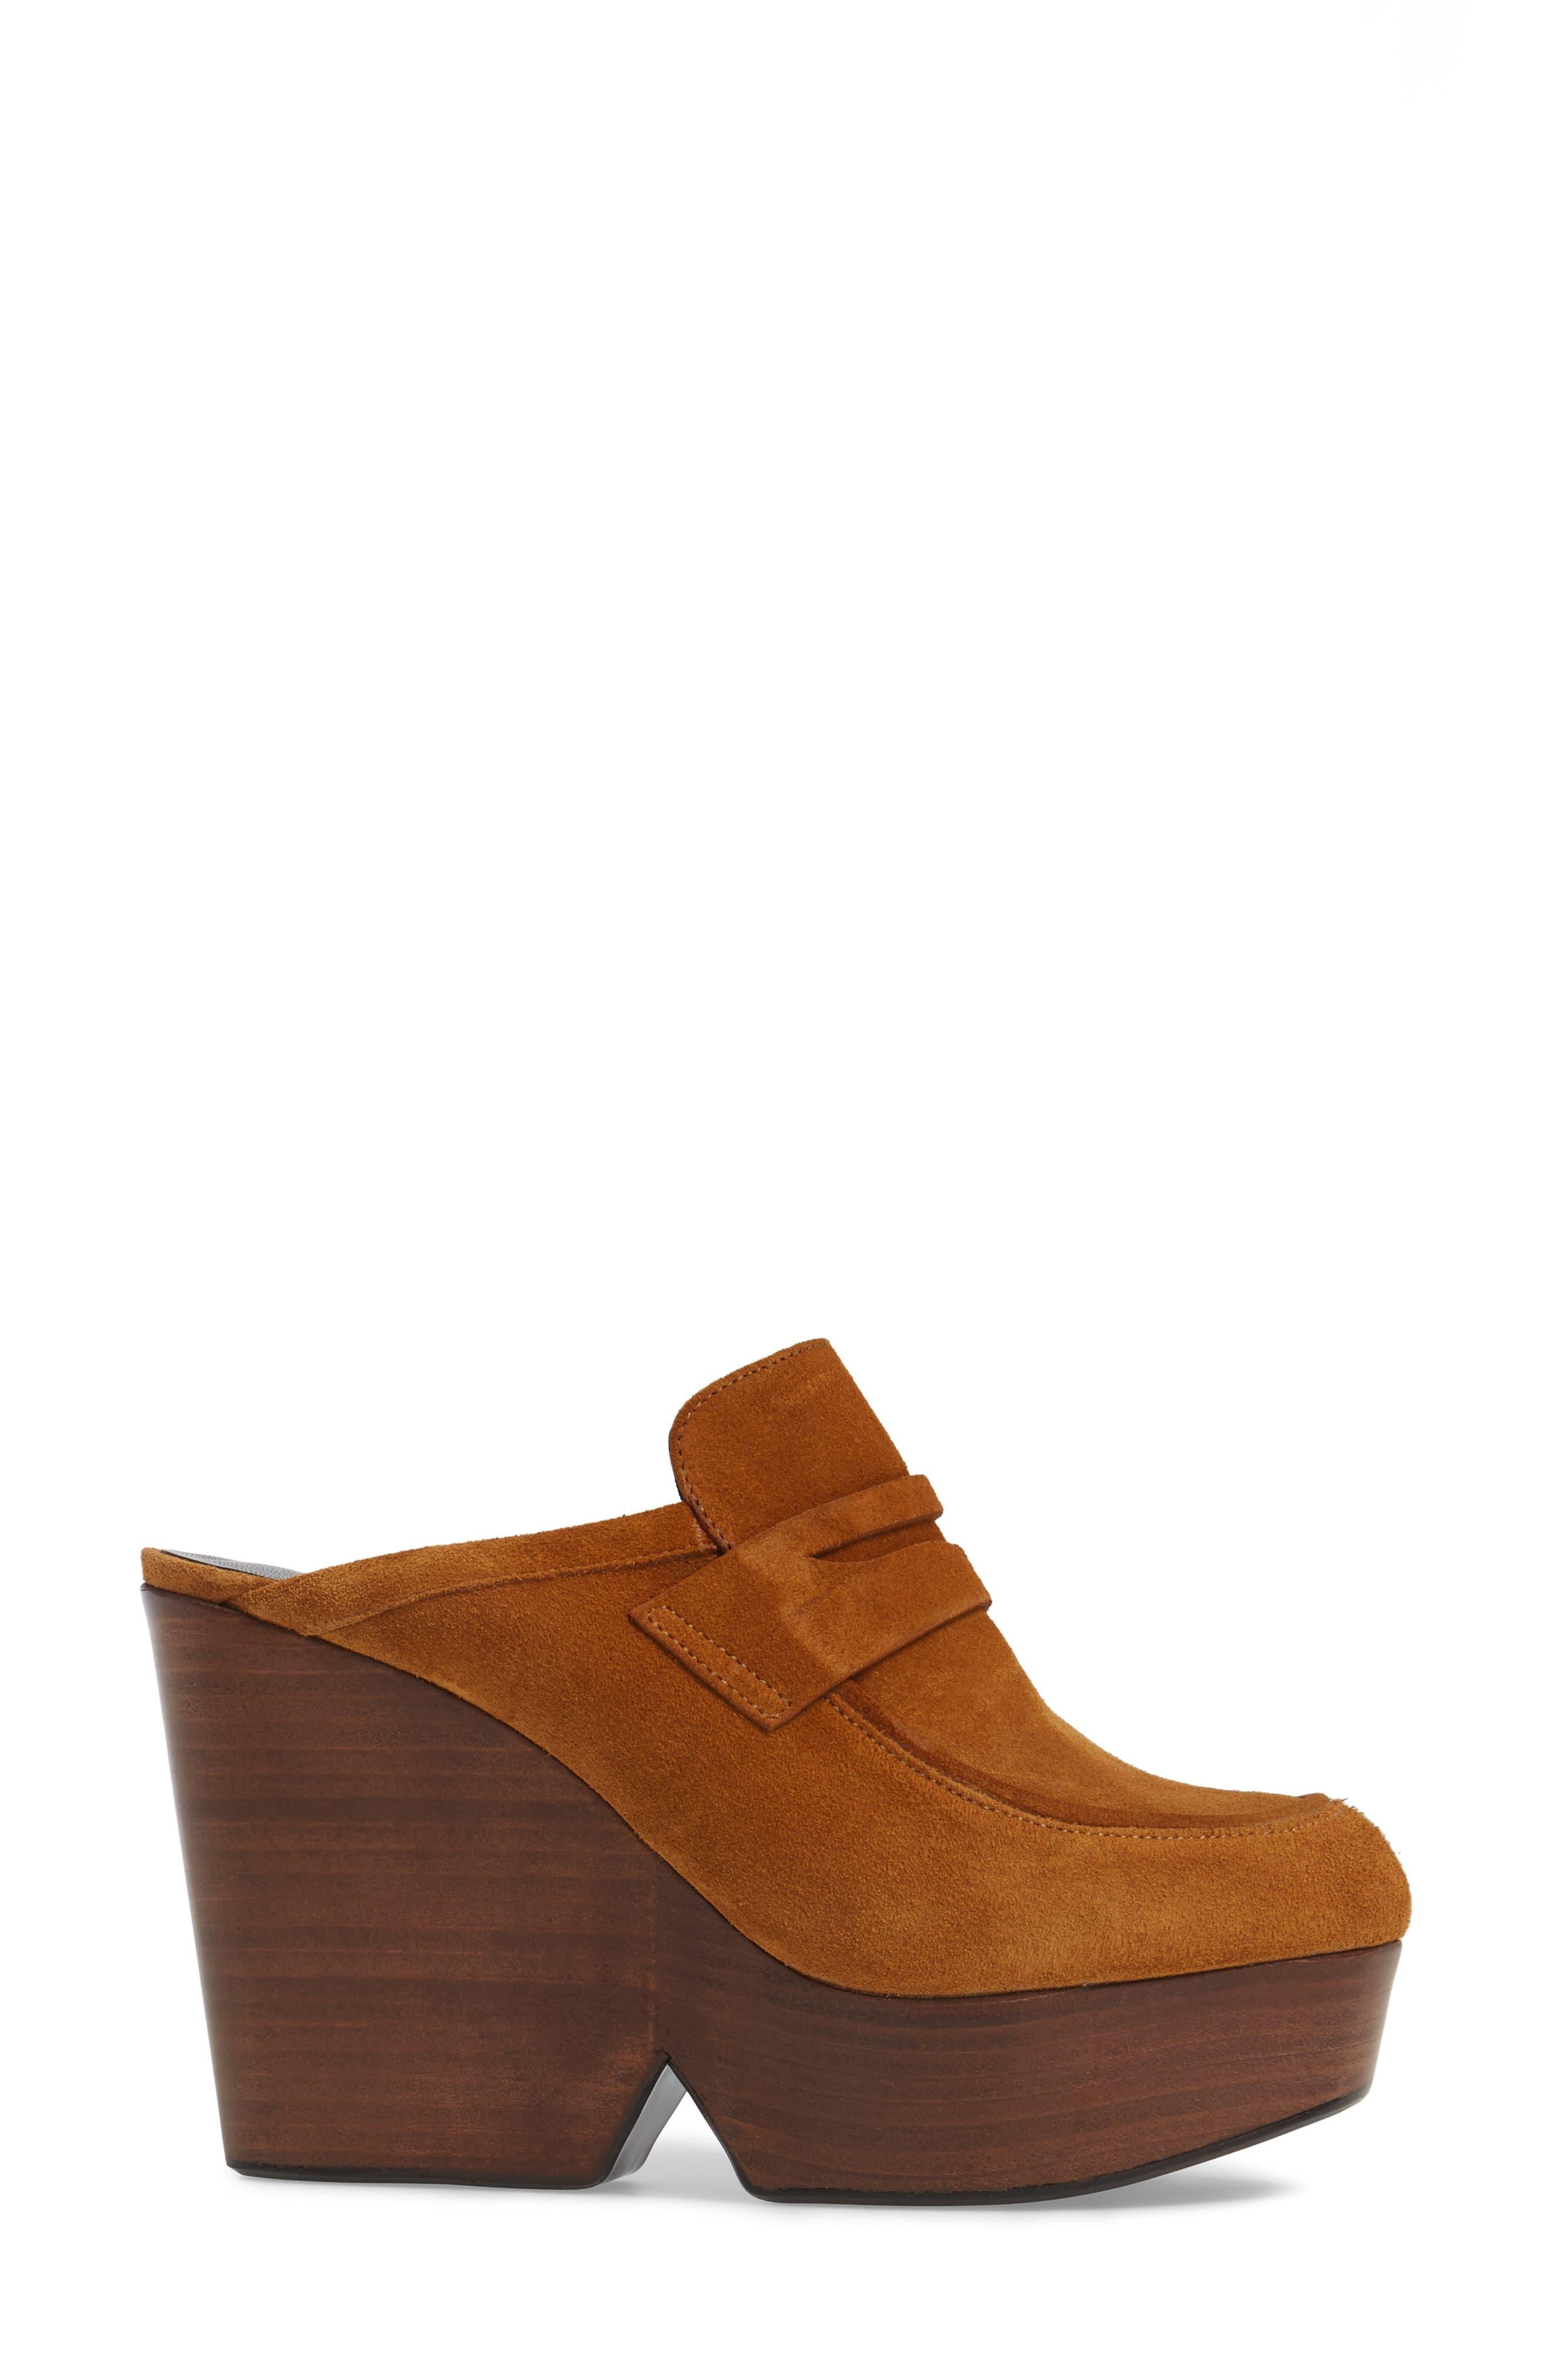 Alternate Image 3  - Robert Clergerie Damor Platform Loafer Mule (Women)